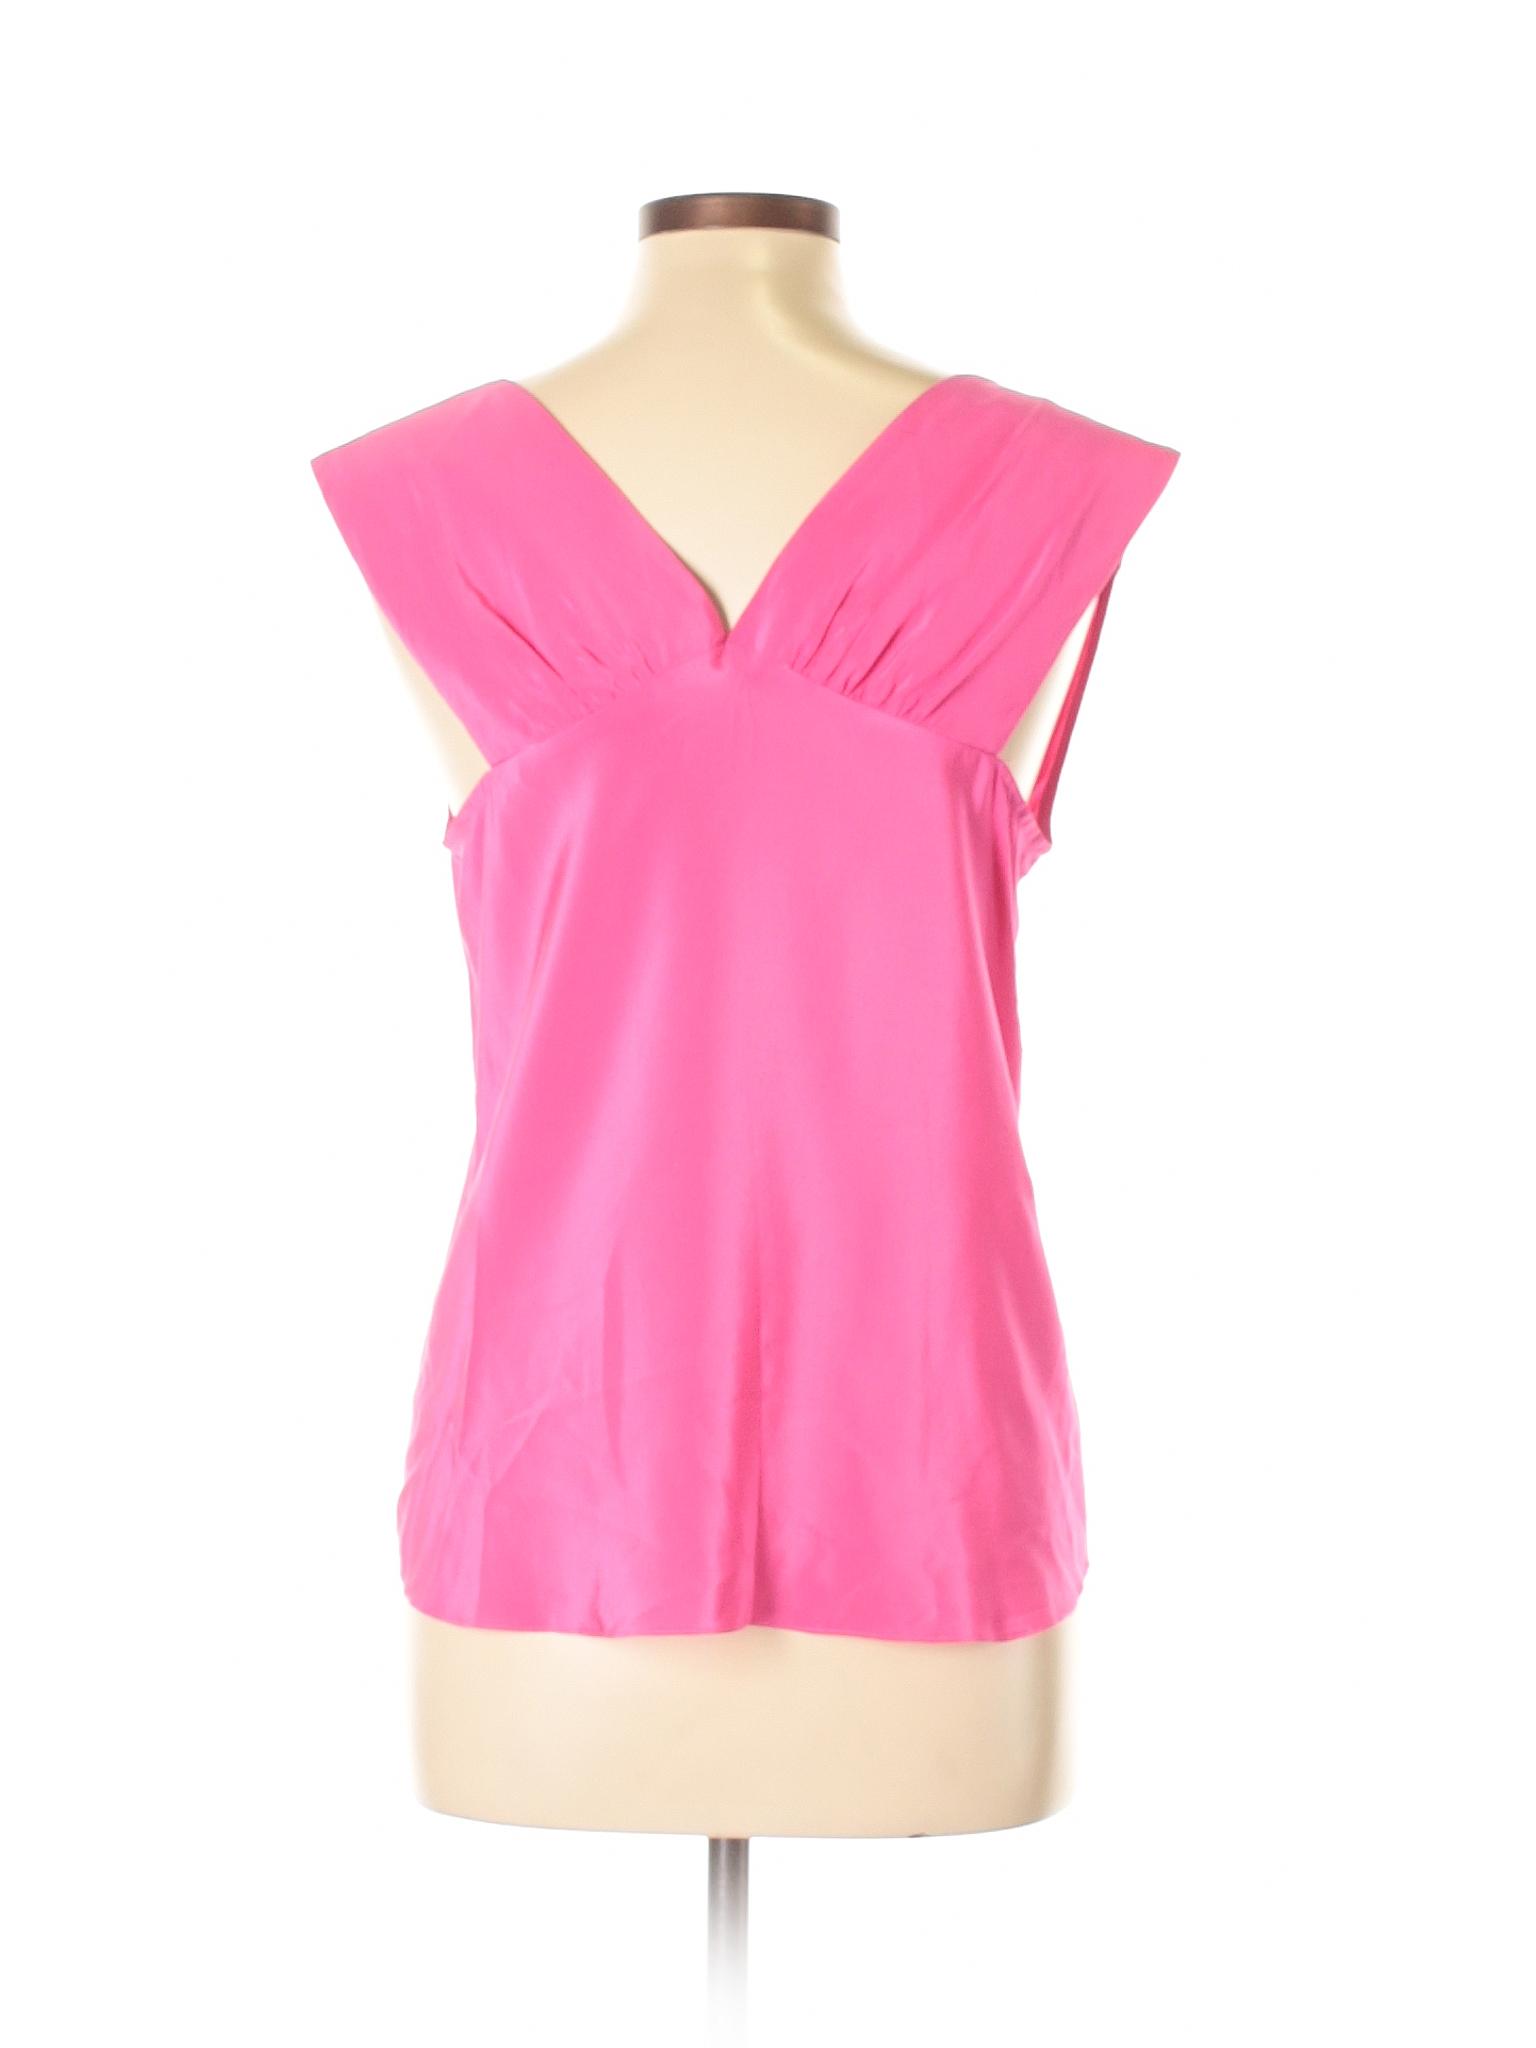 7b7bdac7f3b57c Amanda Uprichard Sleeveless Silk Top  Size 12.00 Pink Women s Tops -  50.99